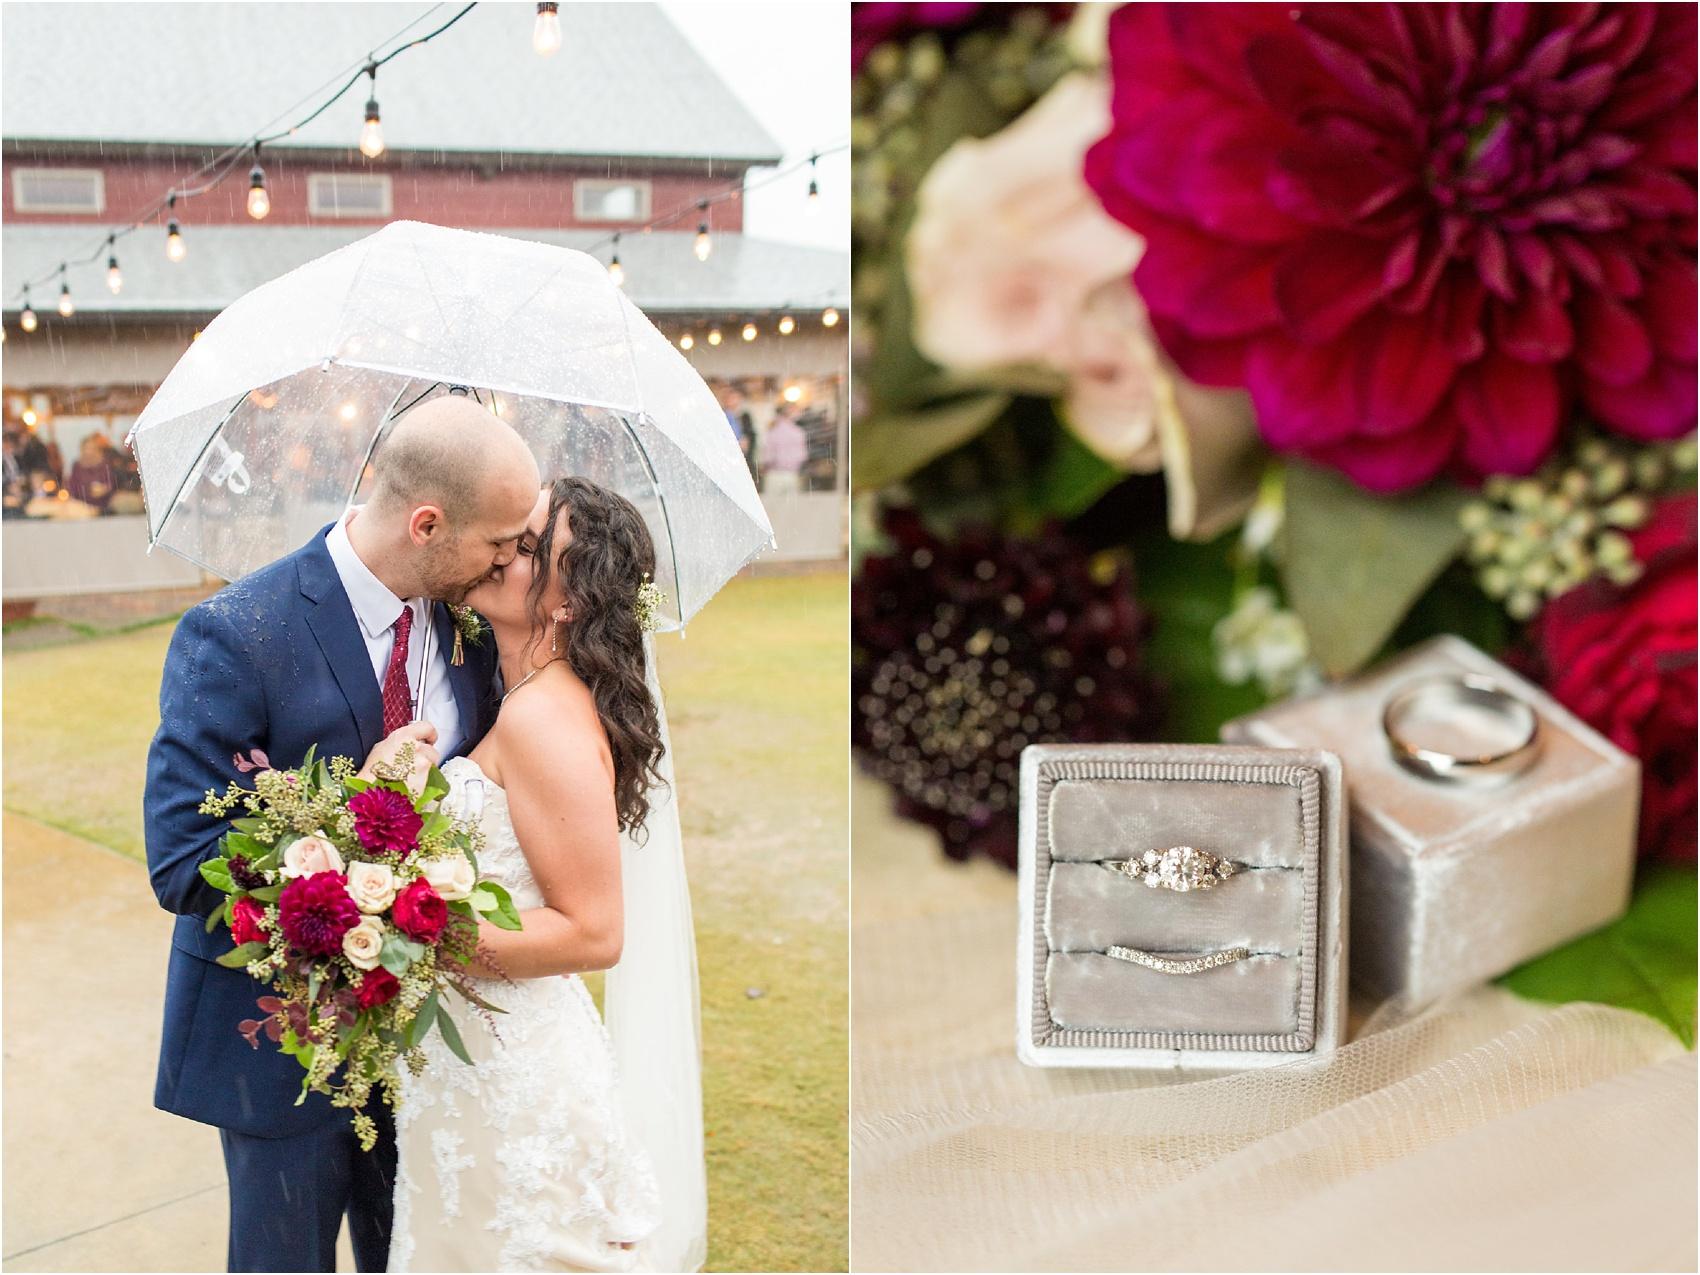 Savannah Eve Photography- Stadele Wedding